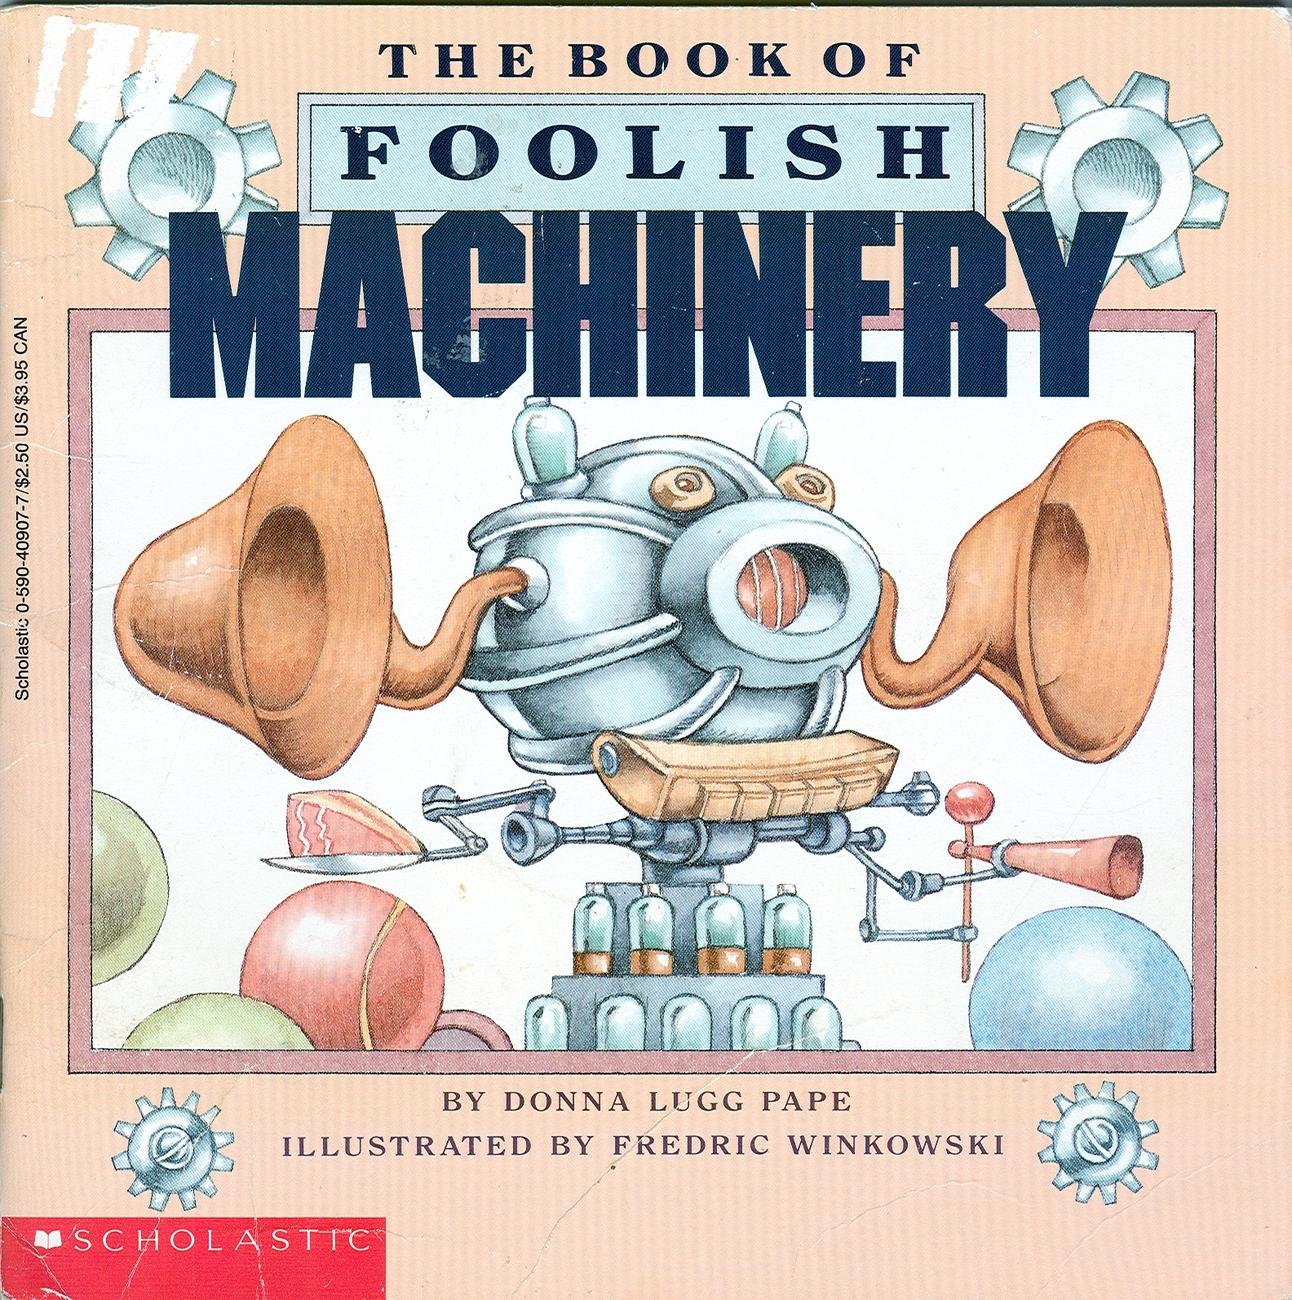 The book of foolish machinery